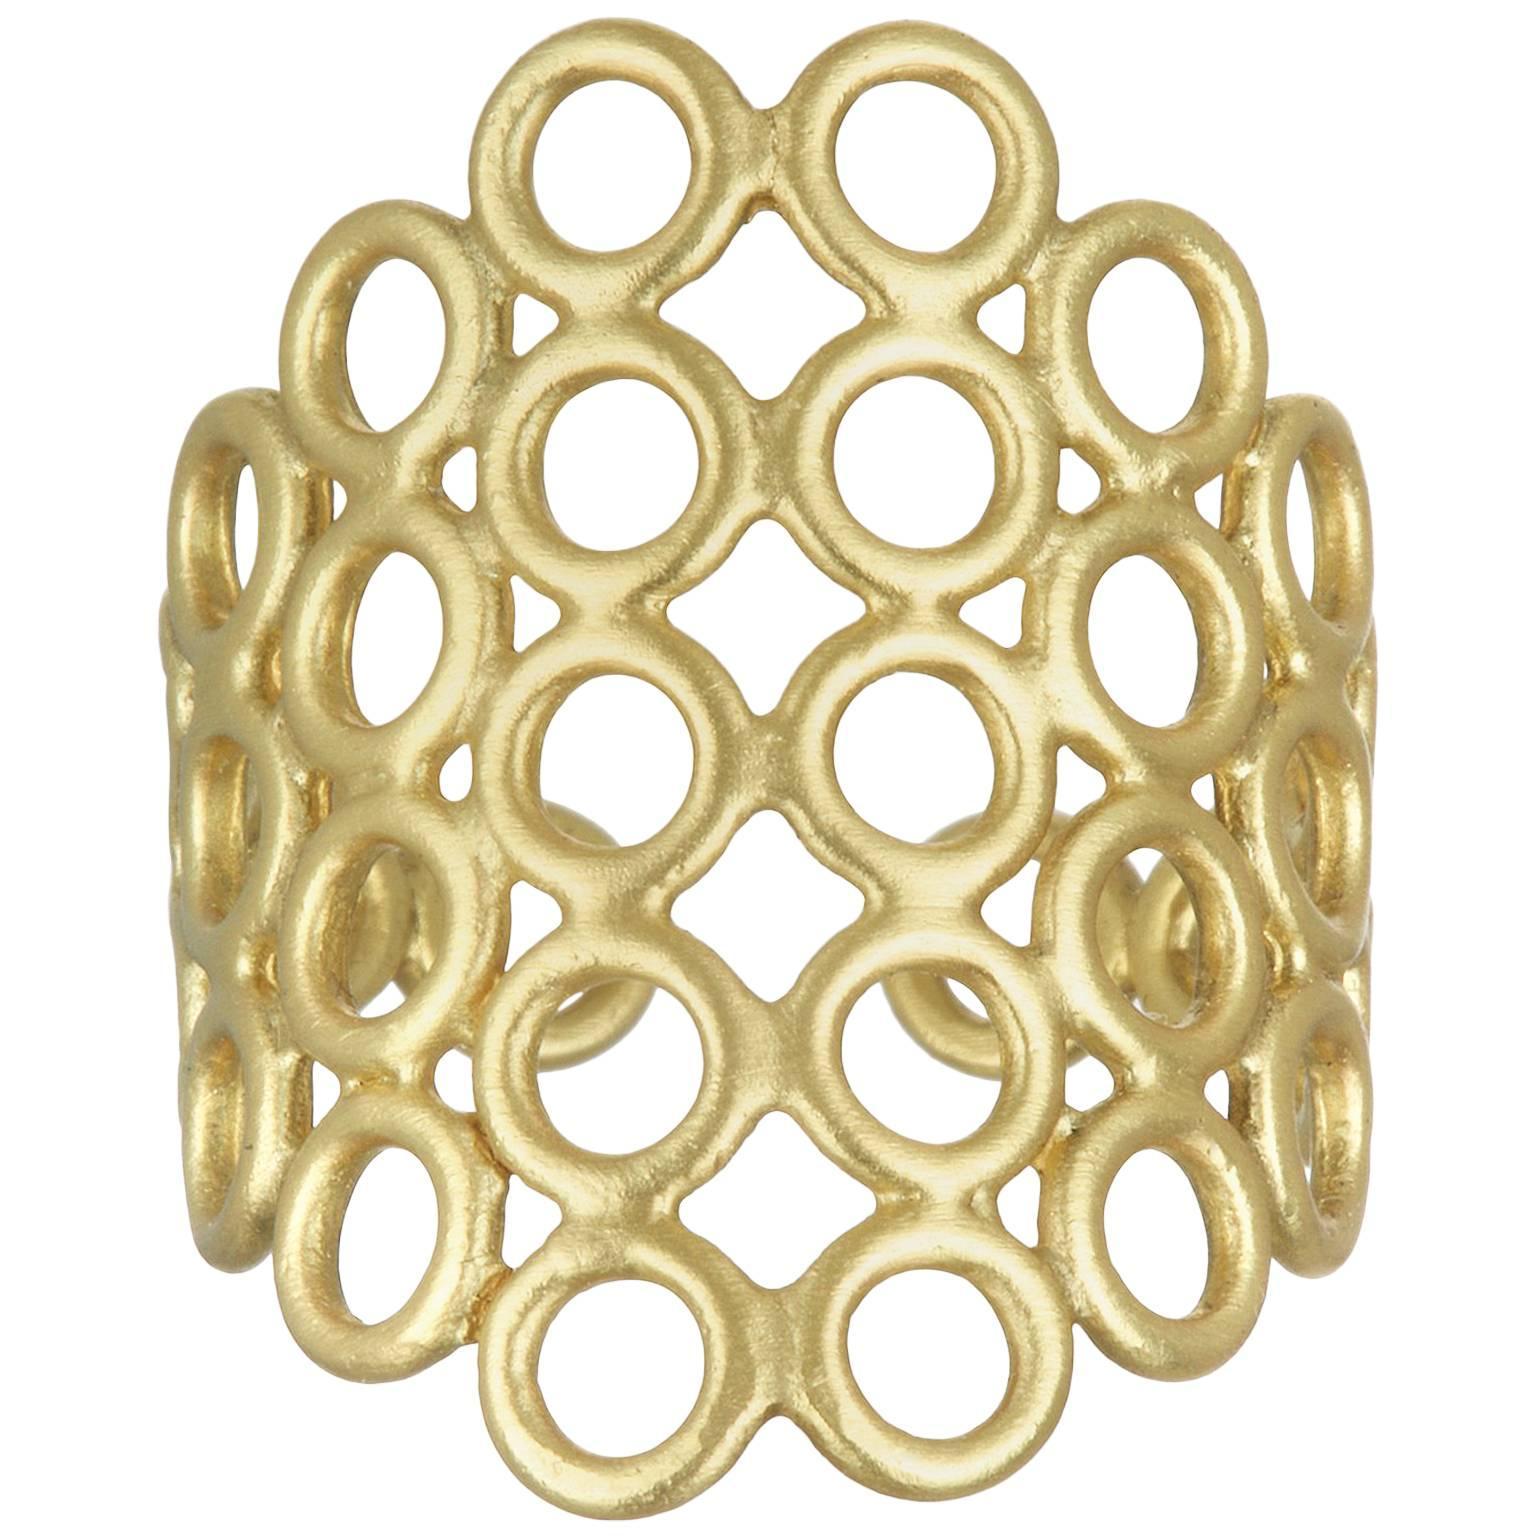 Faye Kim 18 Karat Gold Mesh Ring